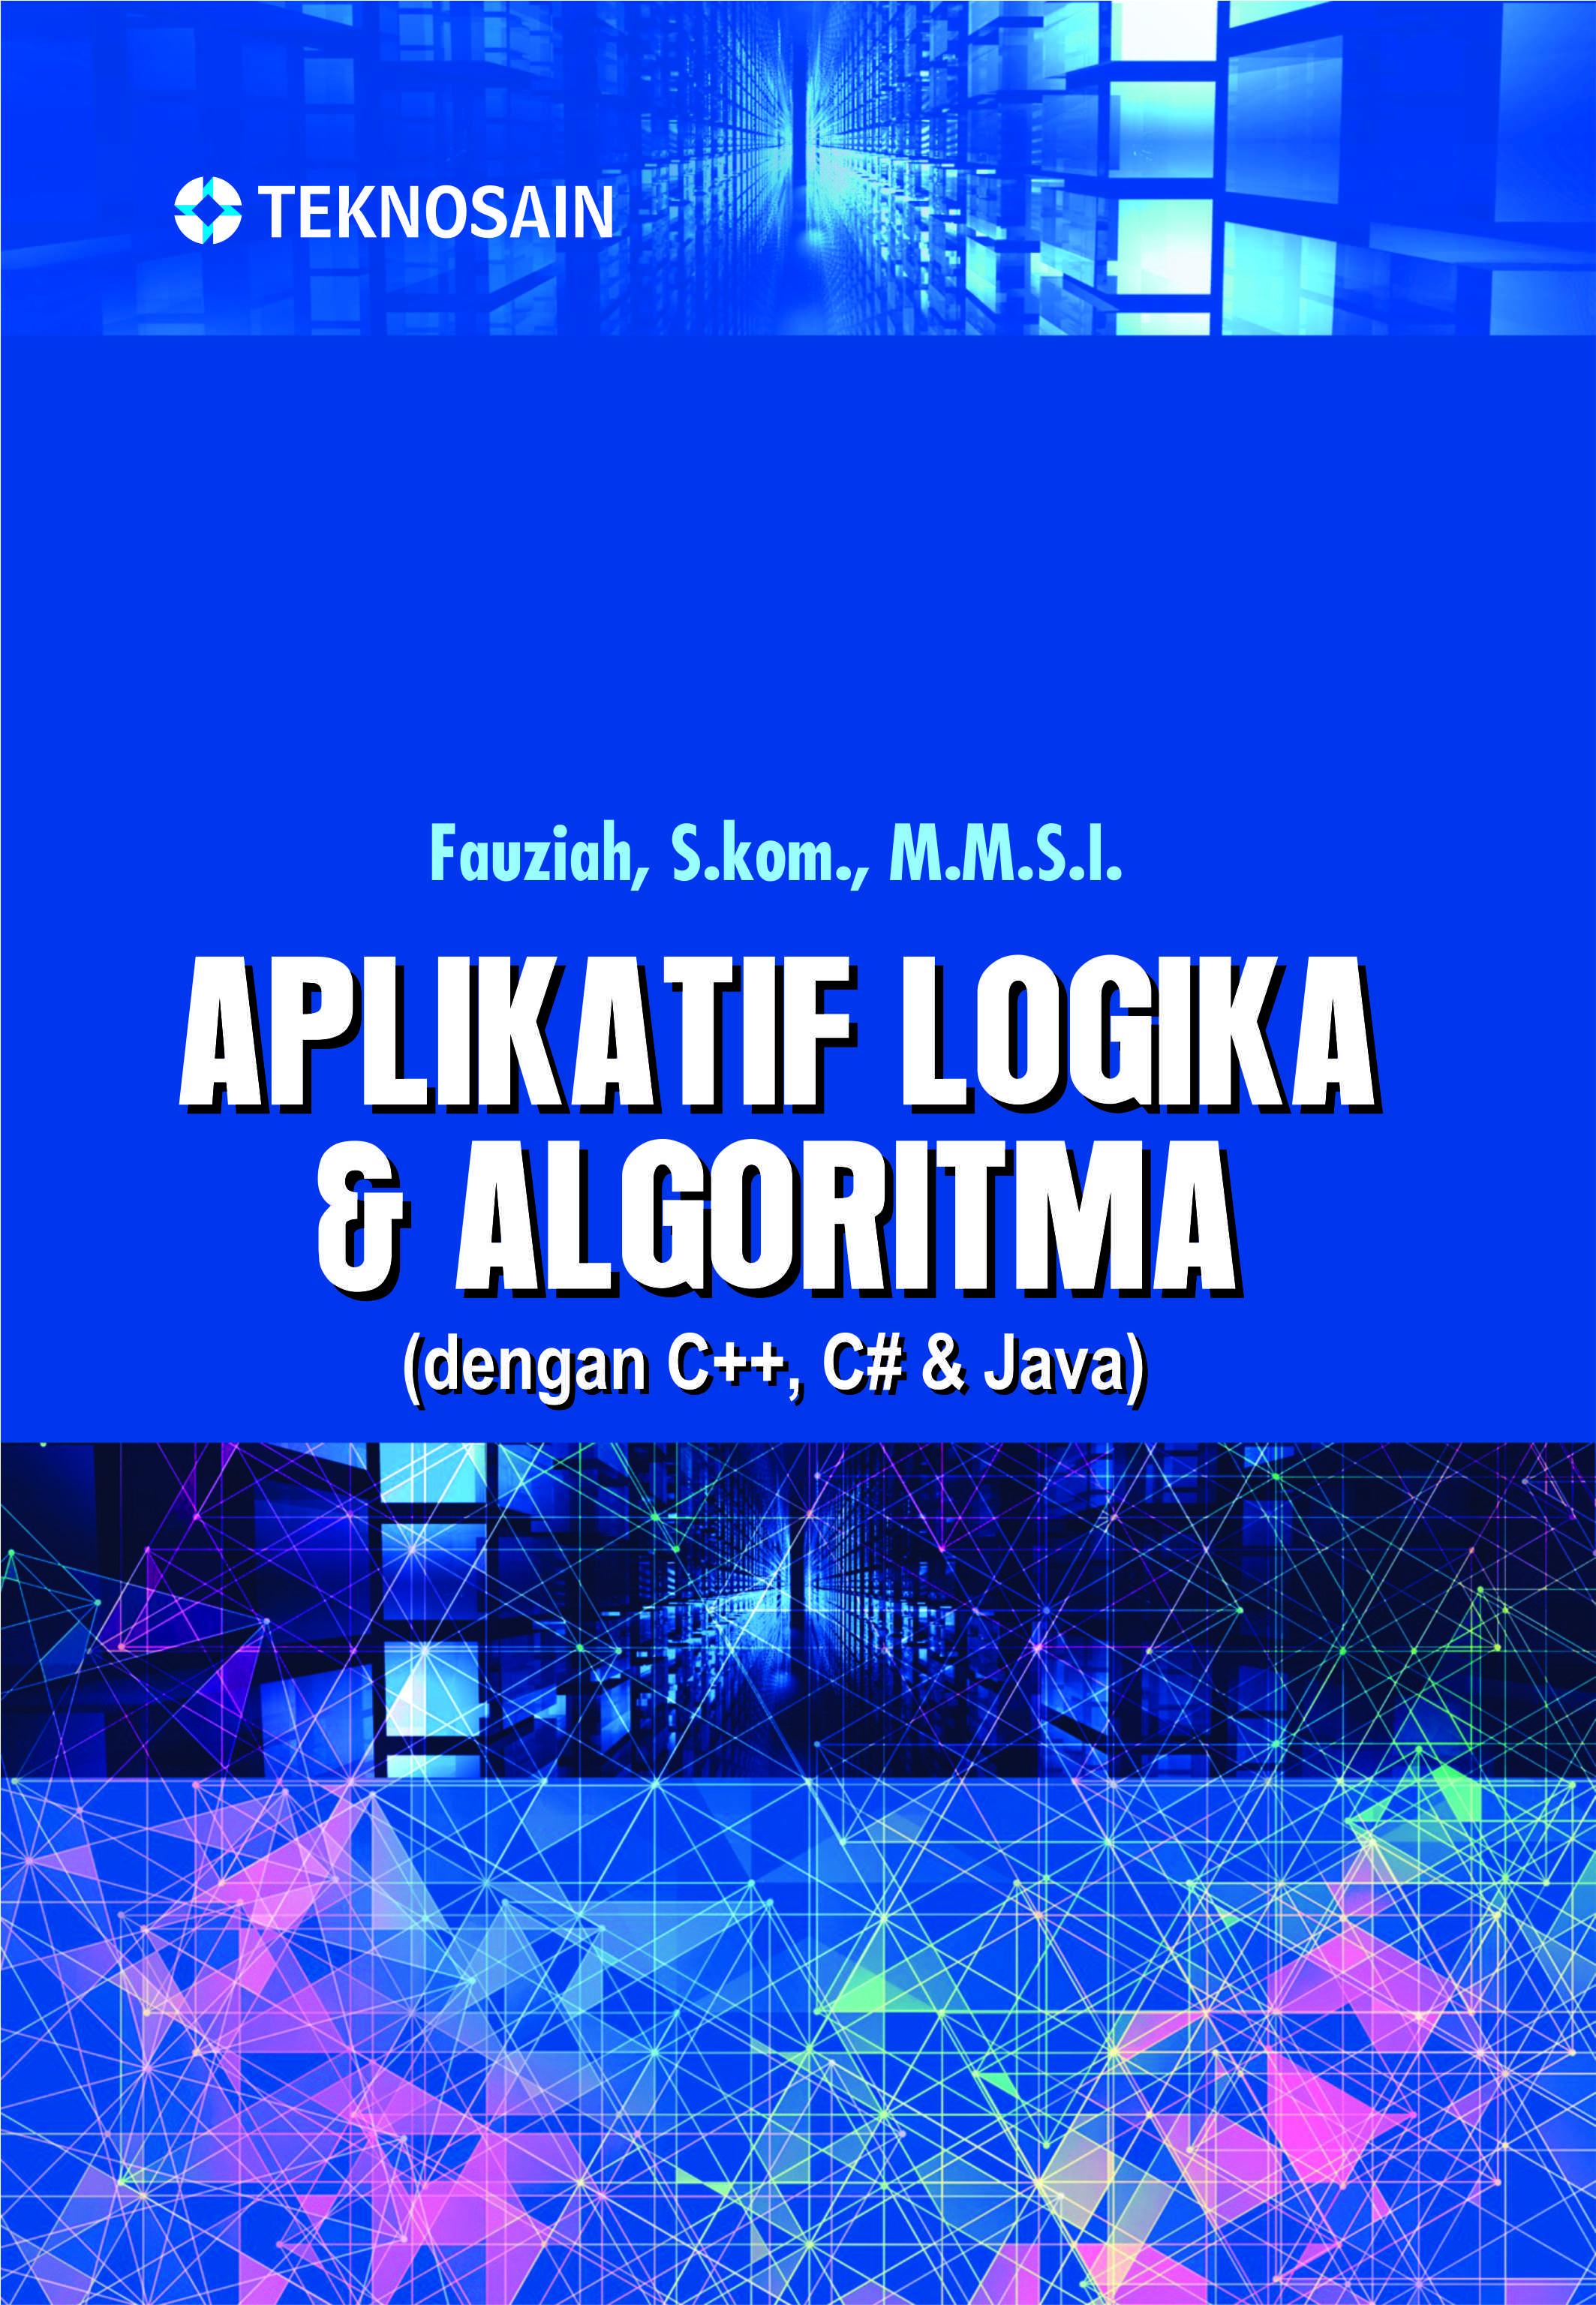 Aplikatif logika dan algoritma dengan c++, c# dan Java [sumber elektronis]